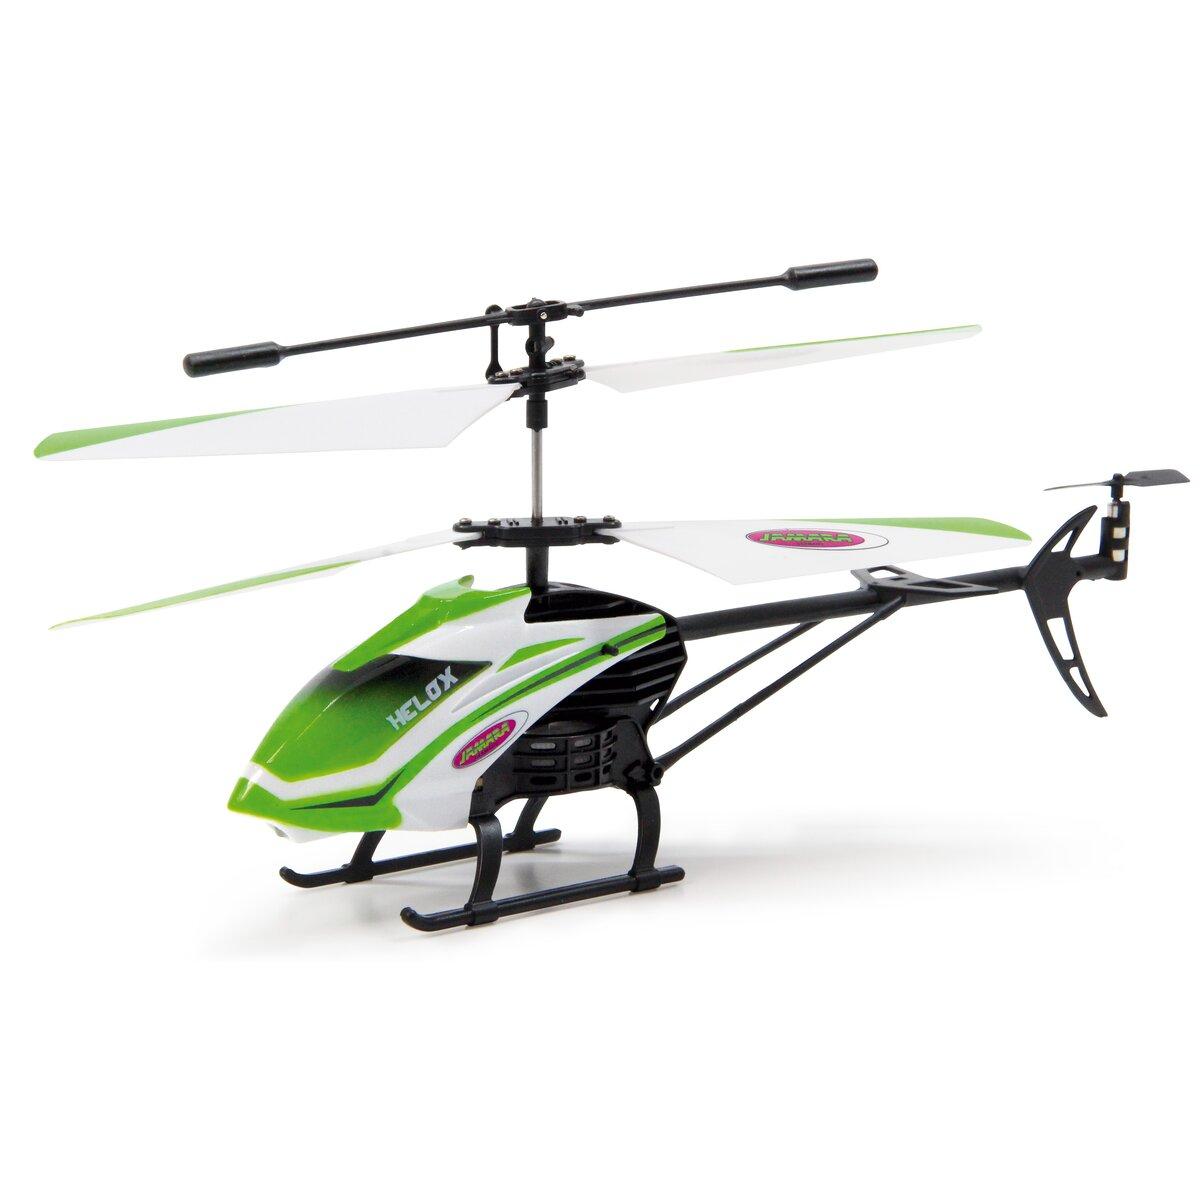 Jamara vrtulník Helox 3+2 Channel Heli Gyro,Light+Demo IR